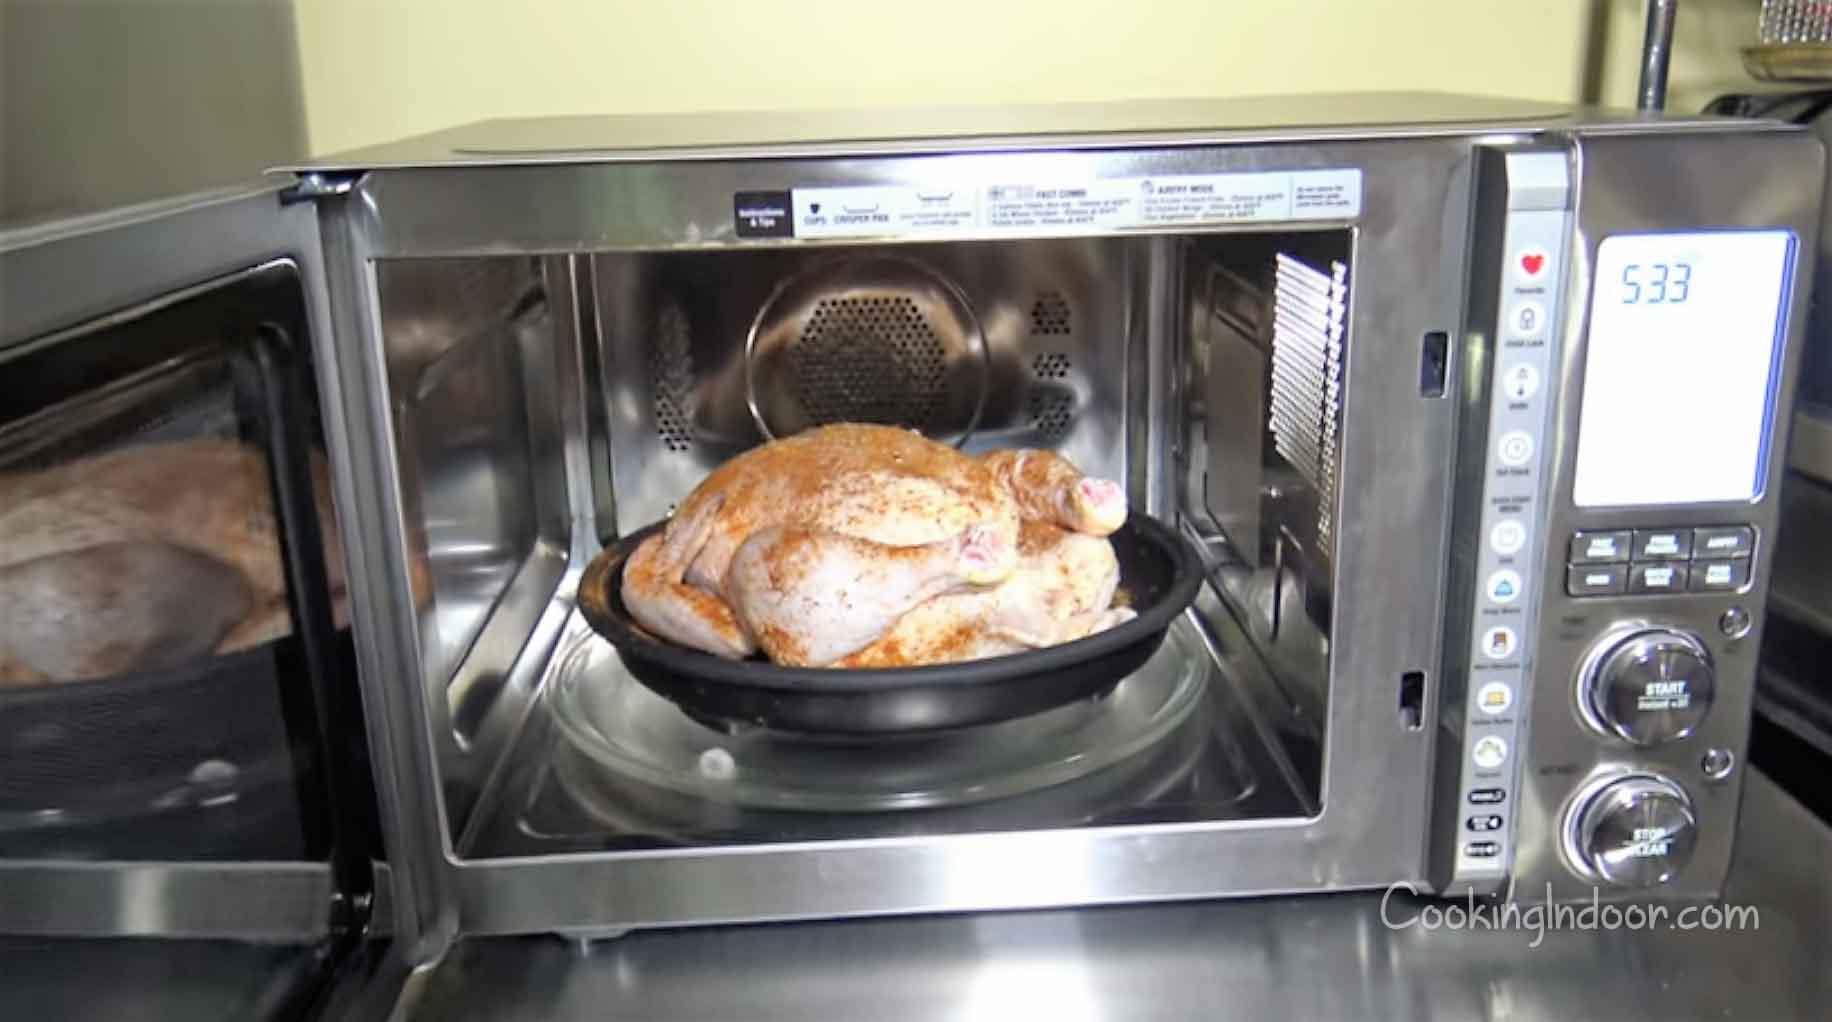 Best digital toaster oven